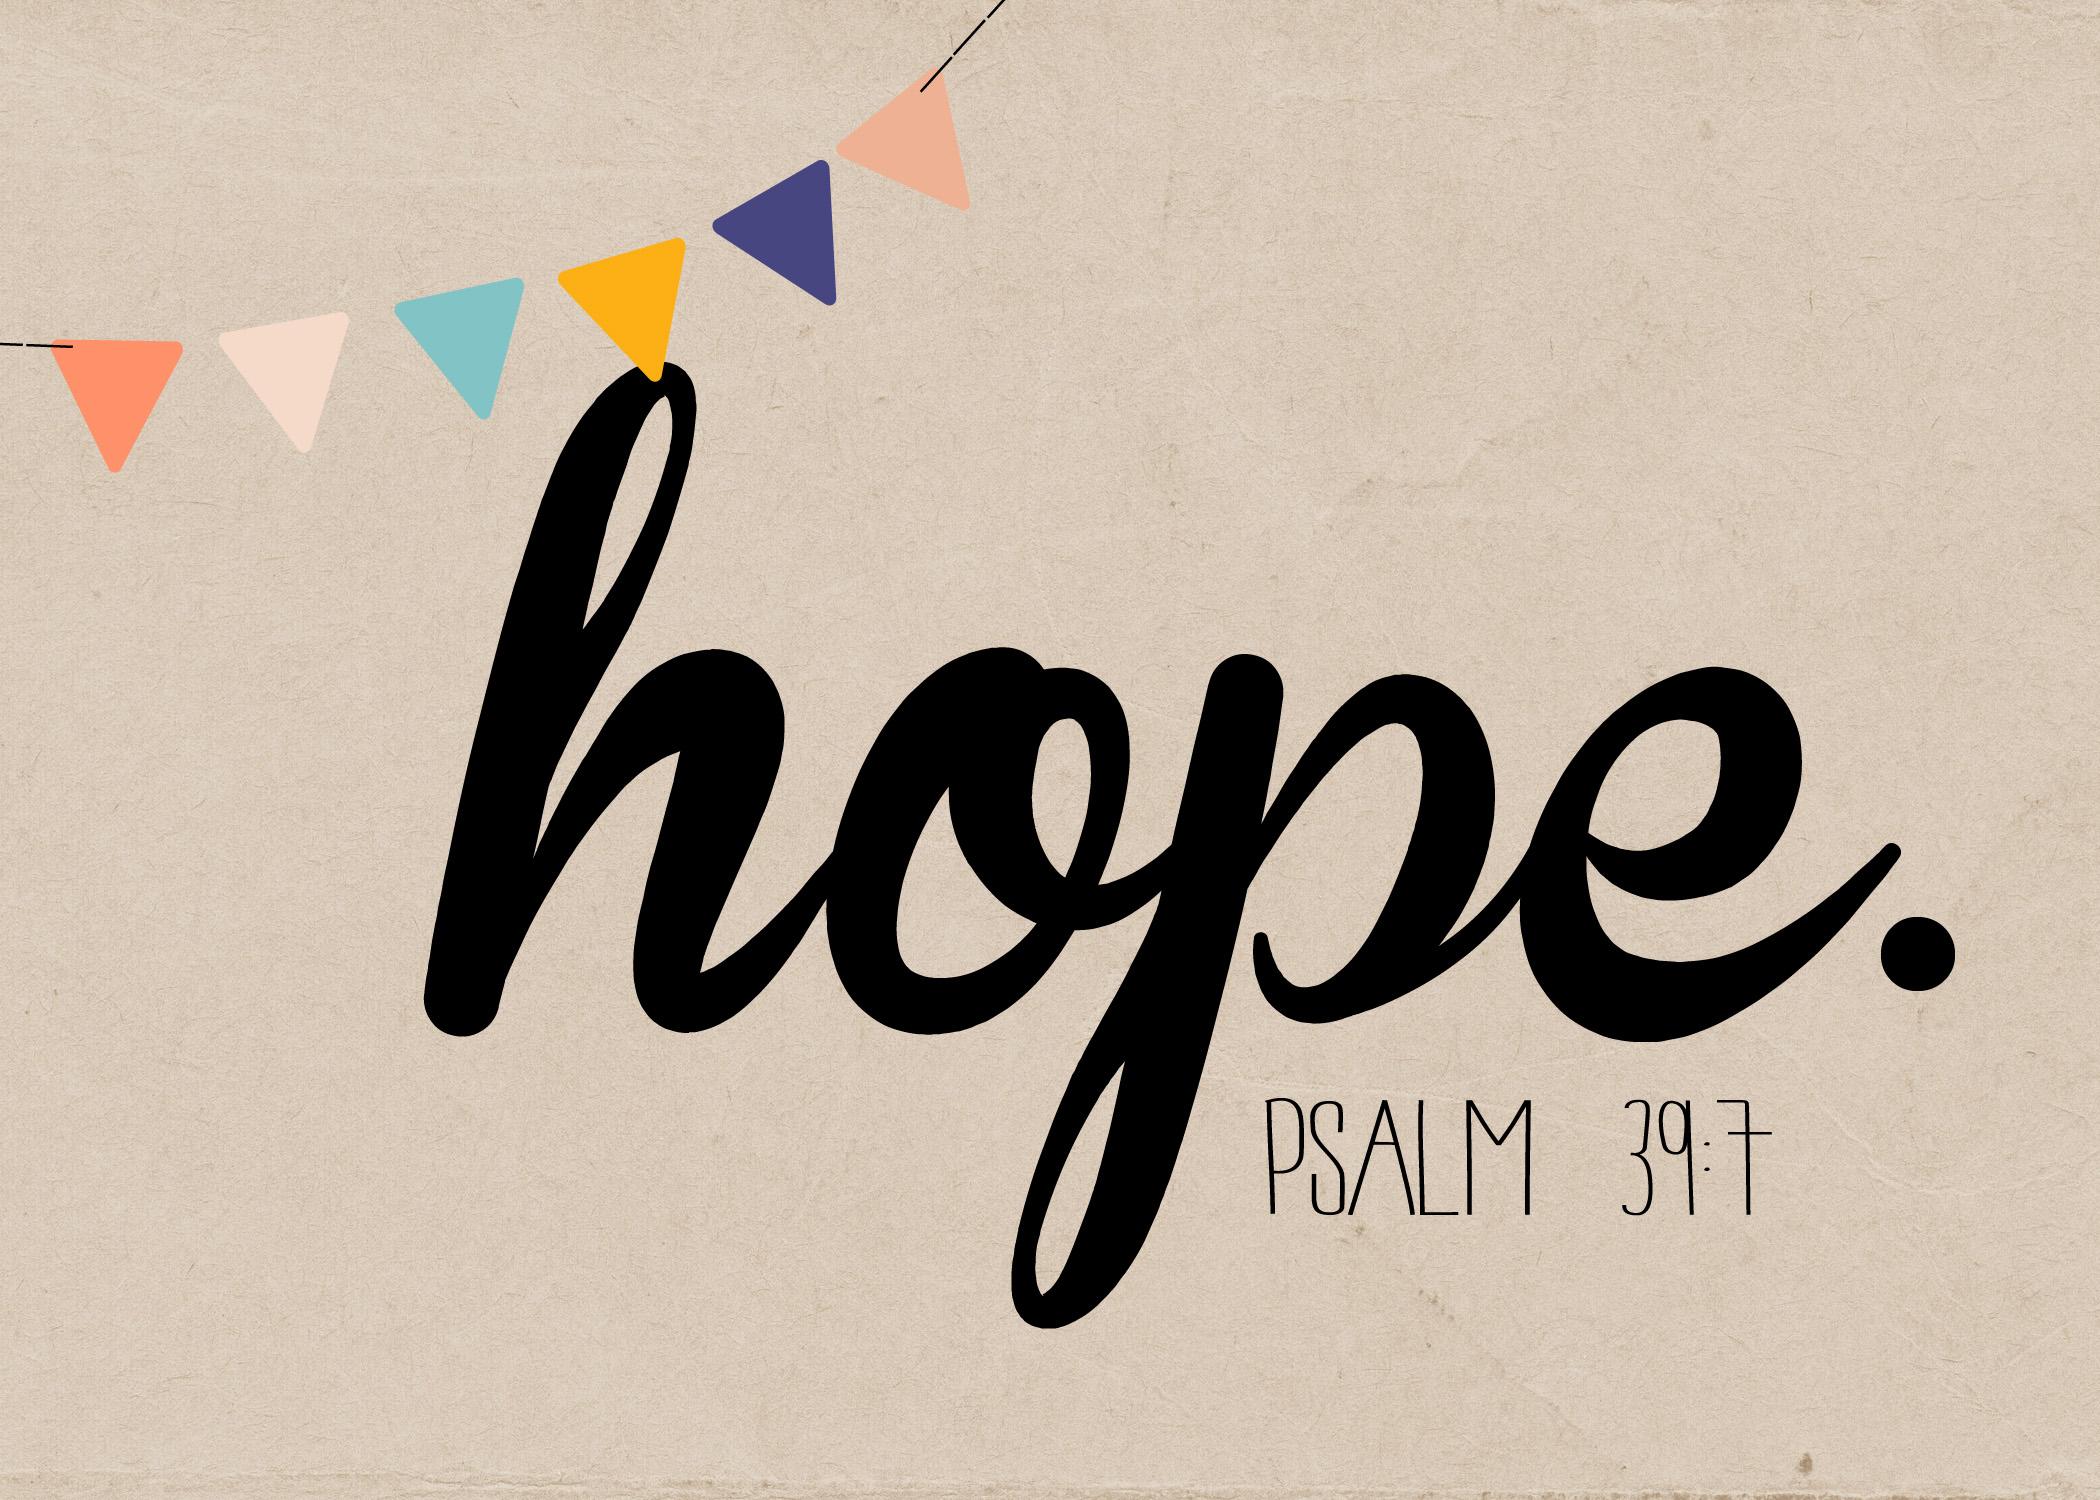 Hope amid hurts